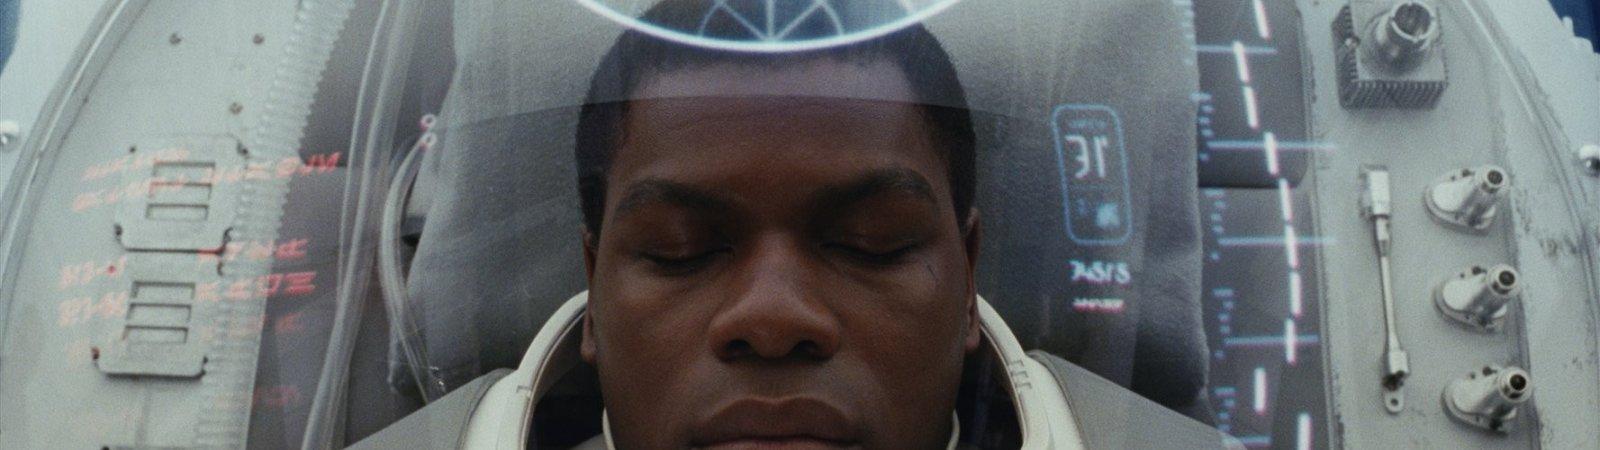 Photo du film : Star Wars : Les derniers Jedi